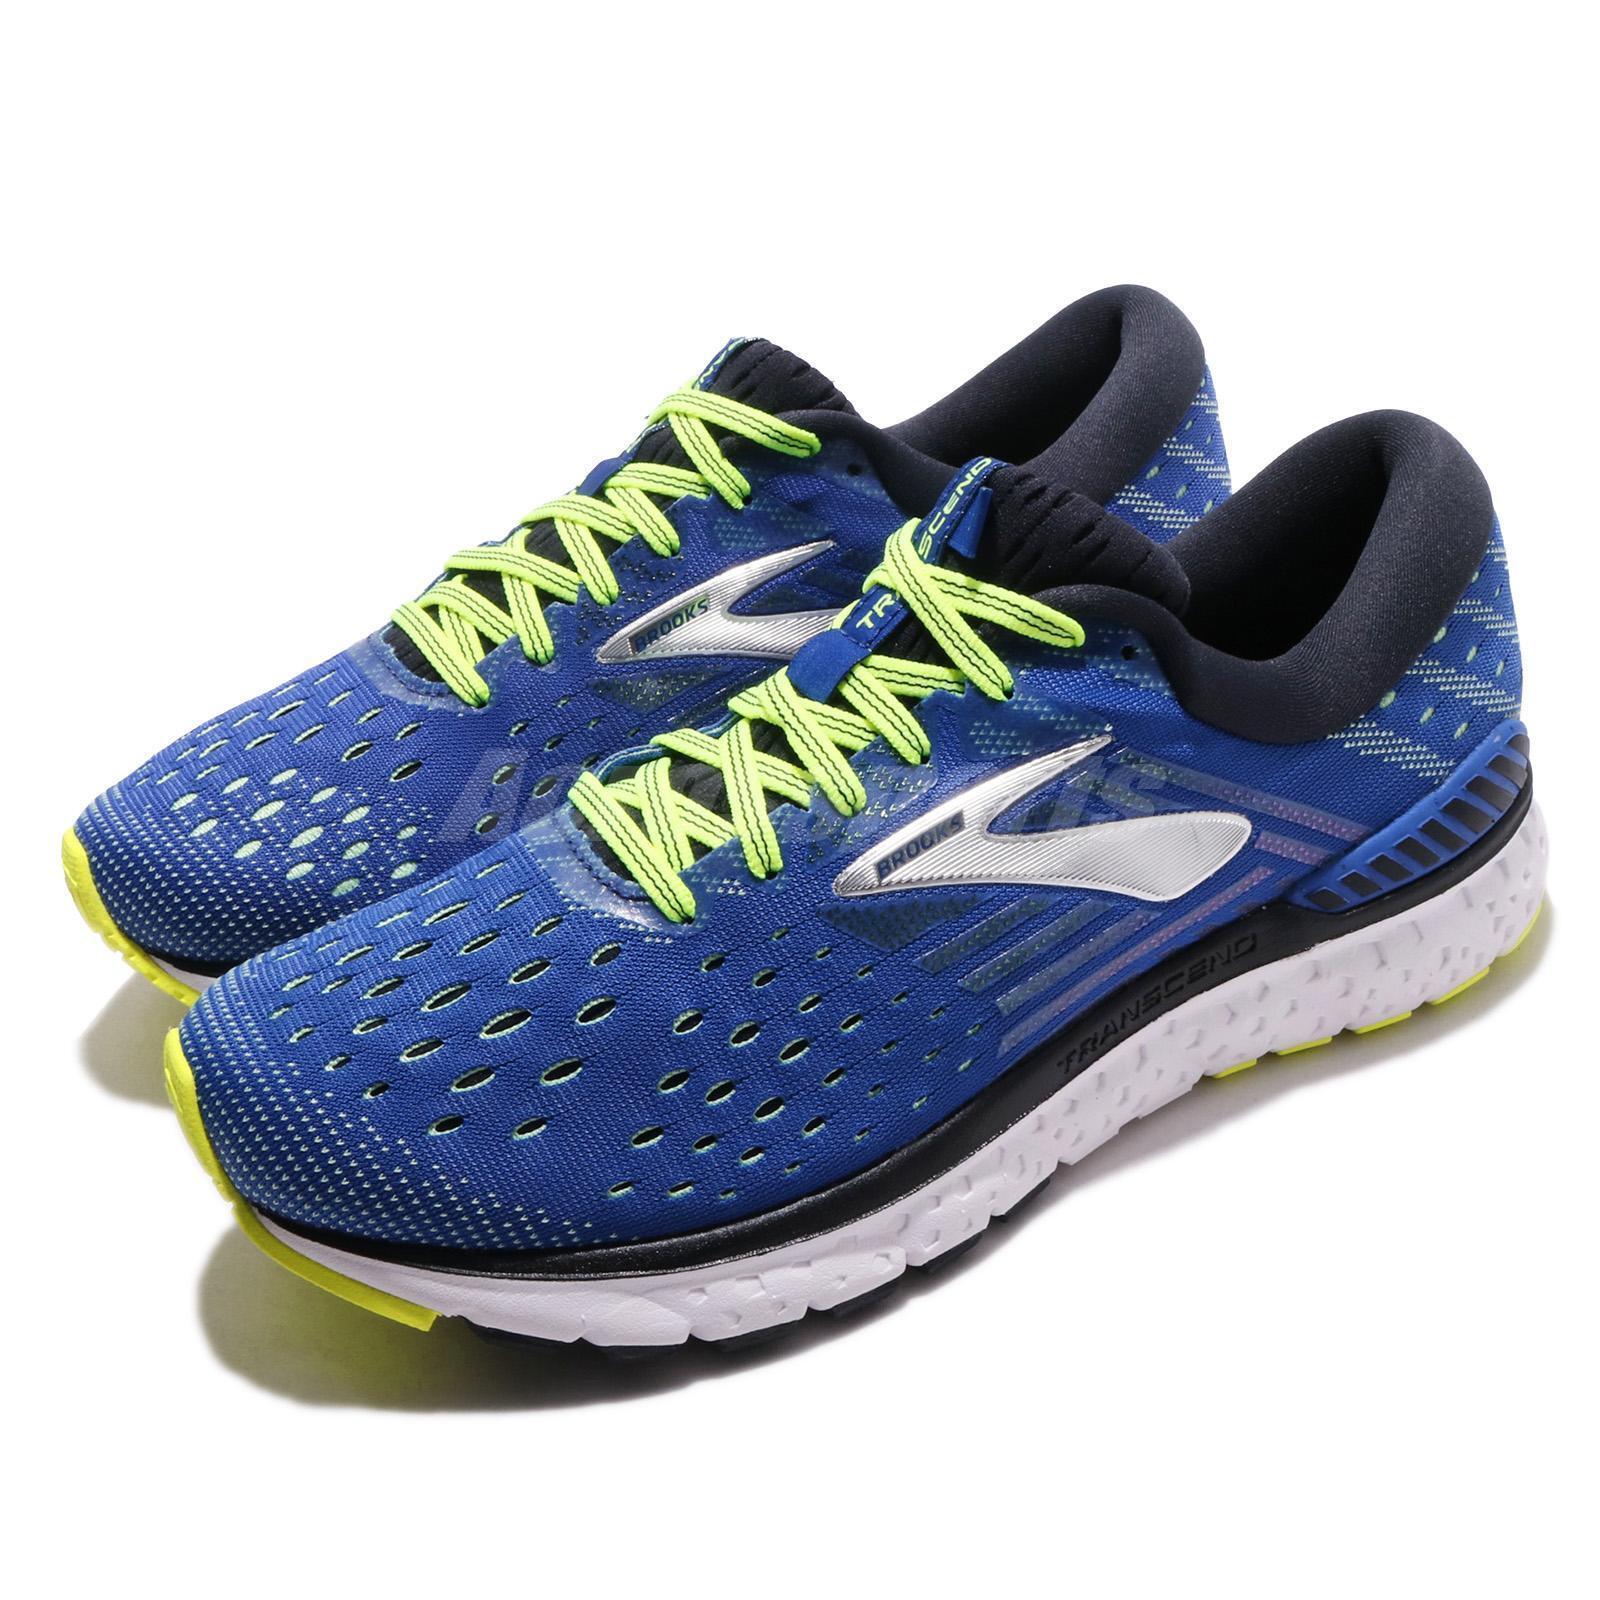 Brooks Transcend 6 blu nero nero nero Nightlife Men Running scarpe scarpe da ginnastica 110299 1D | Buona qualità  d5cbd6